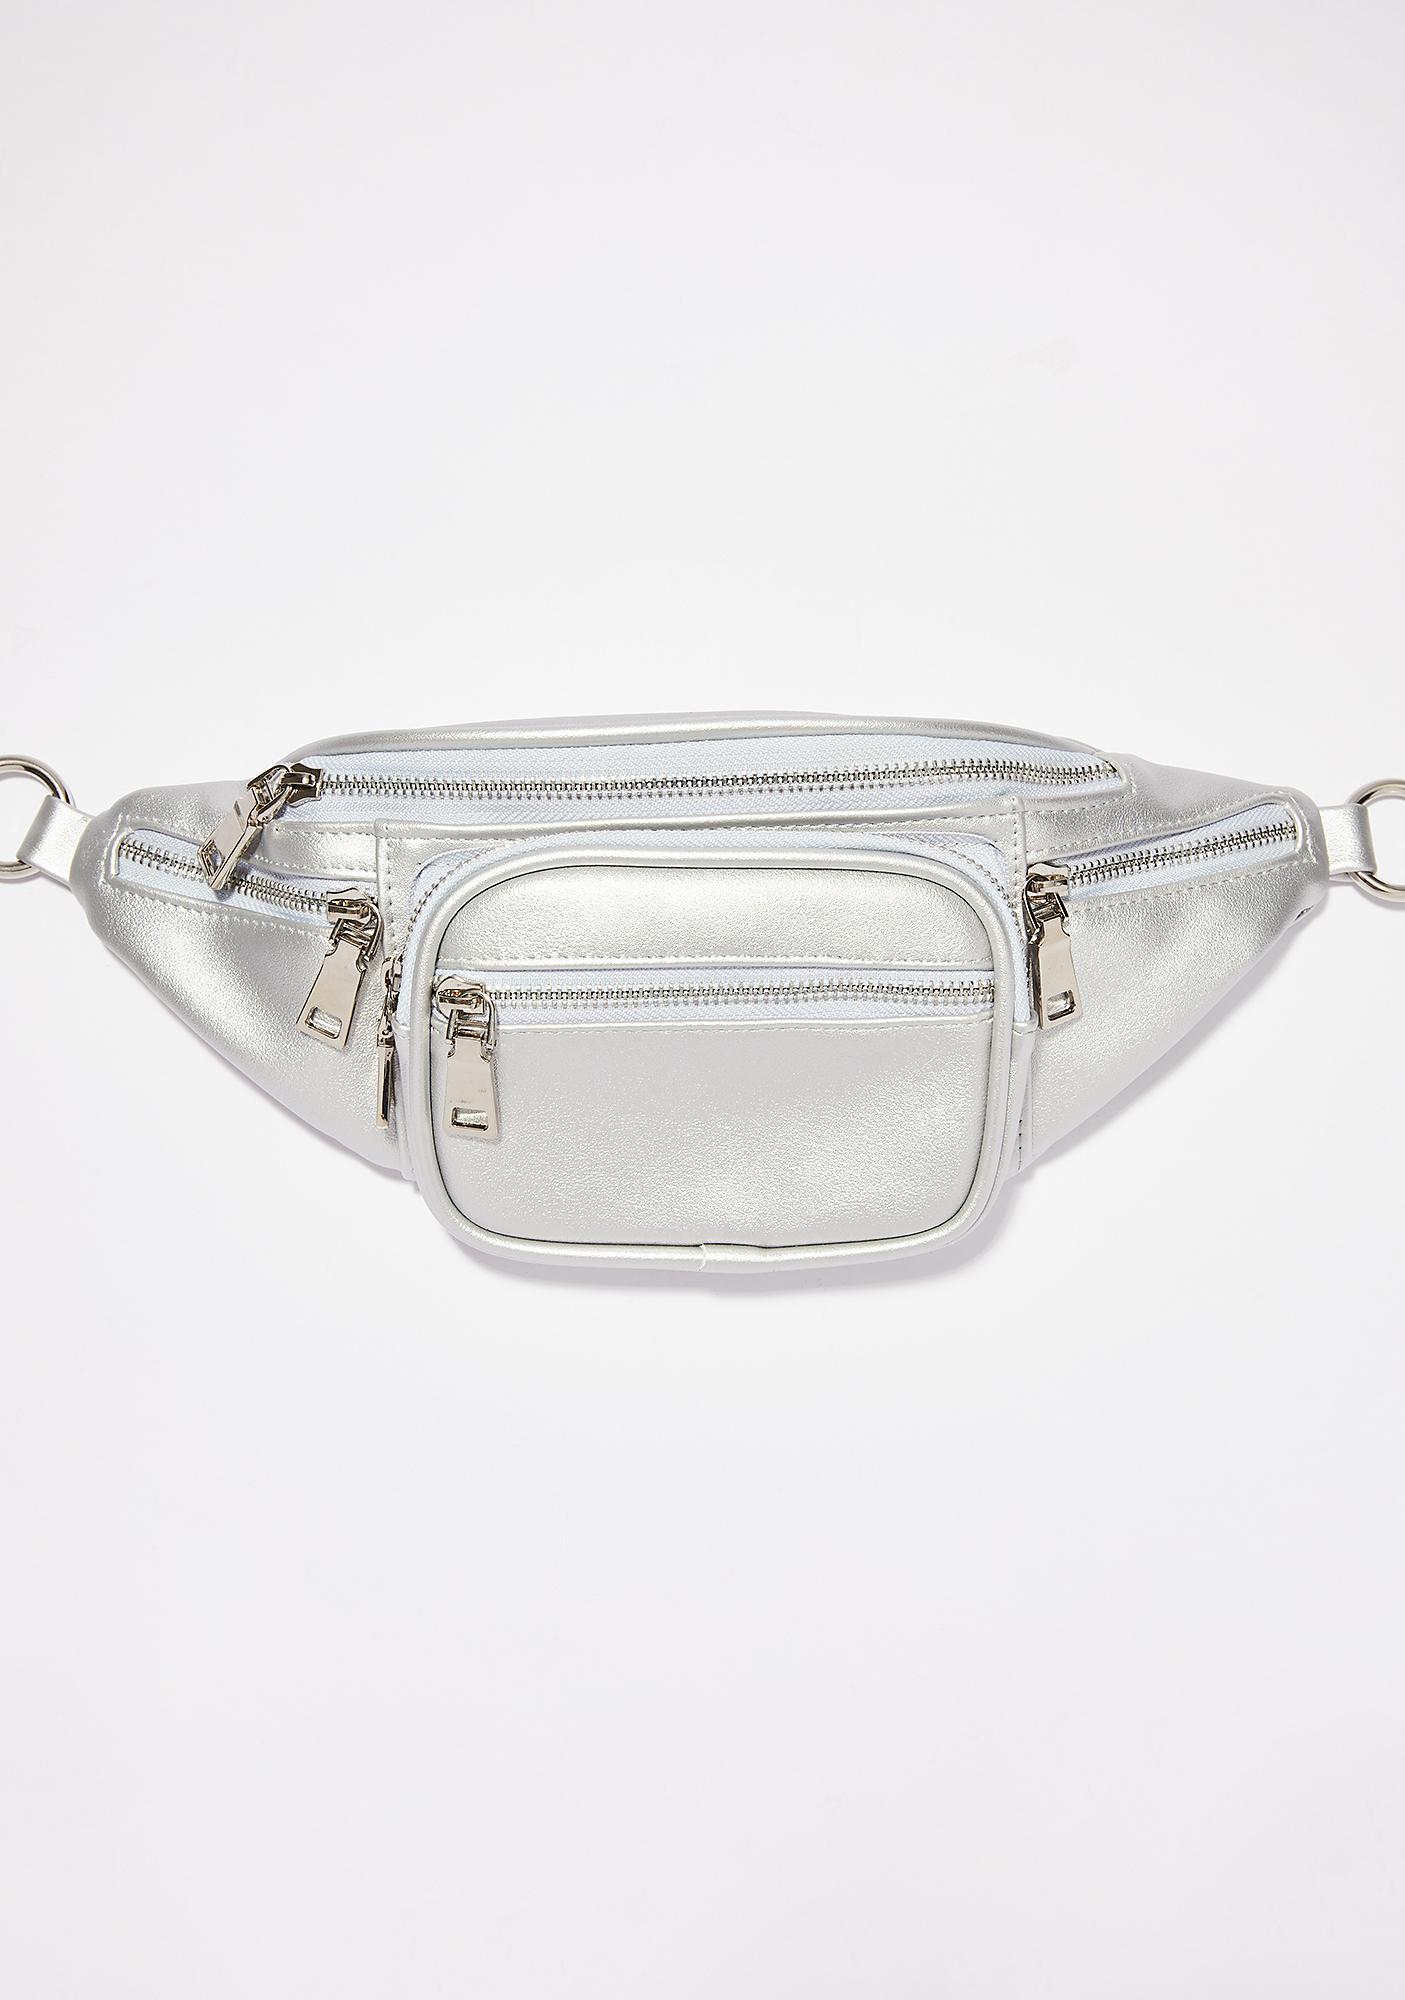 Electric Feelings Chain Waist Bag